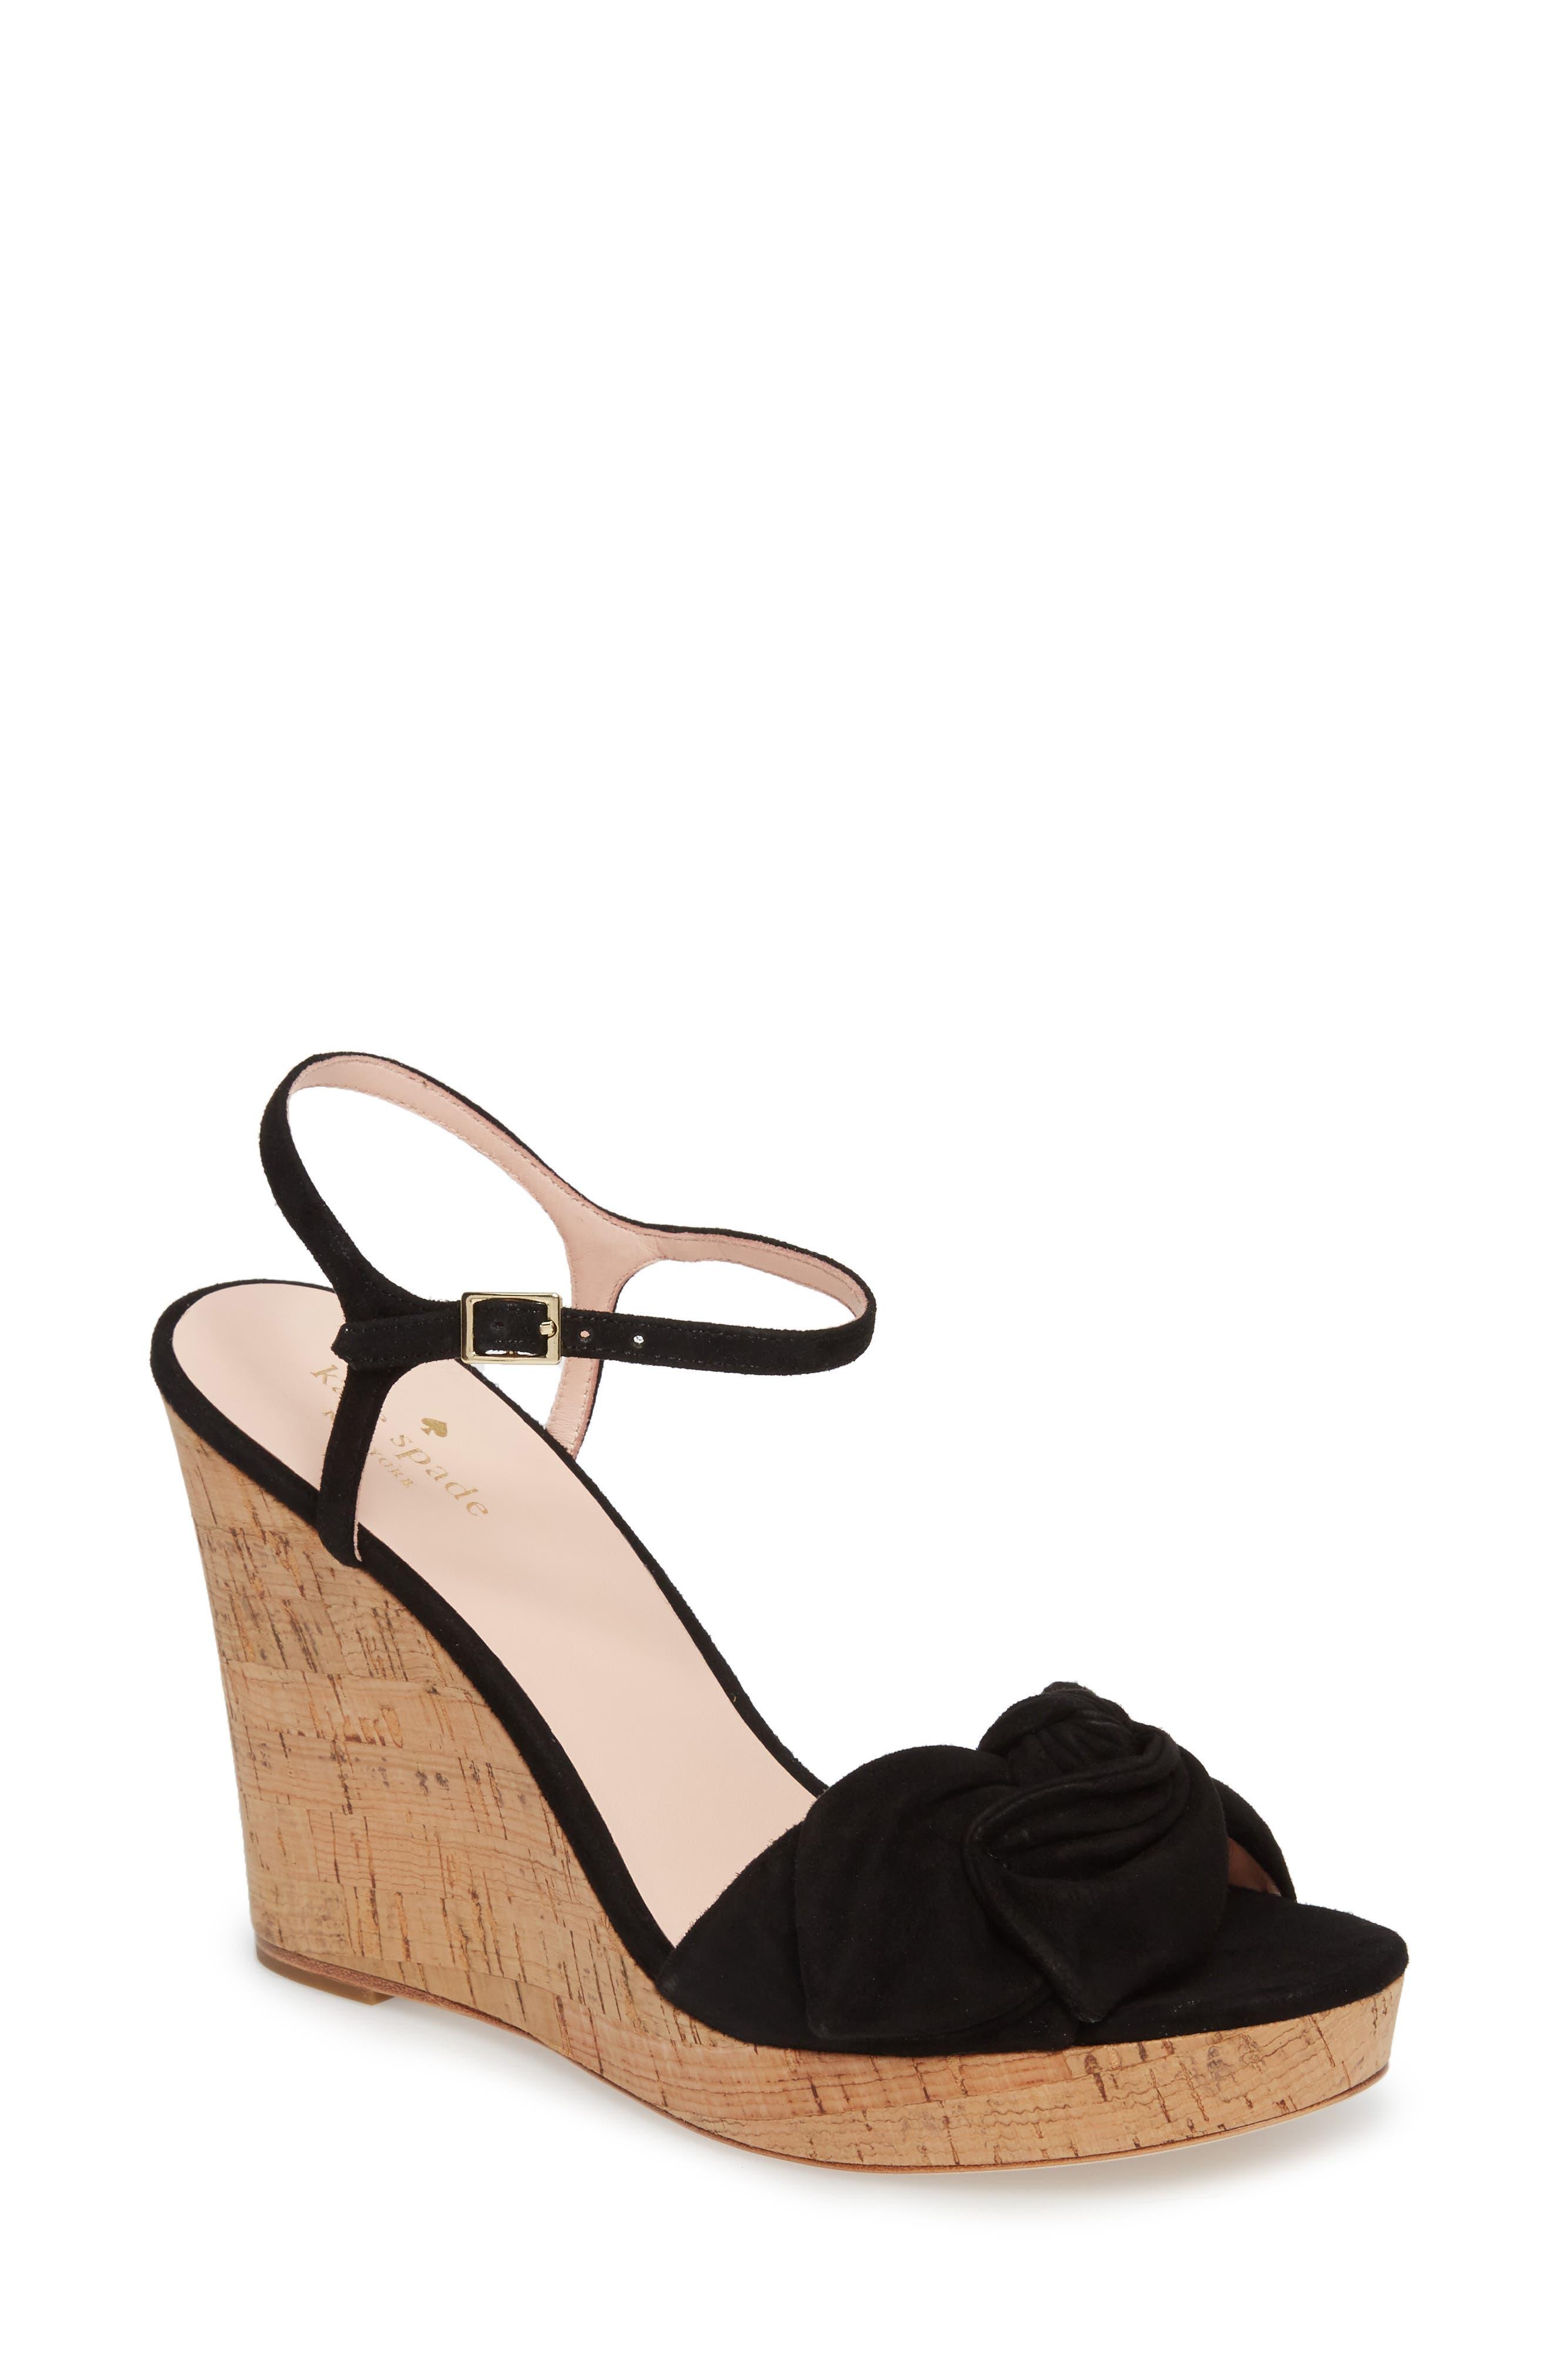 janae knot platform wedge sandal,                         Main,                         color, 001